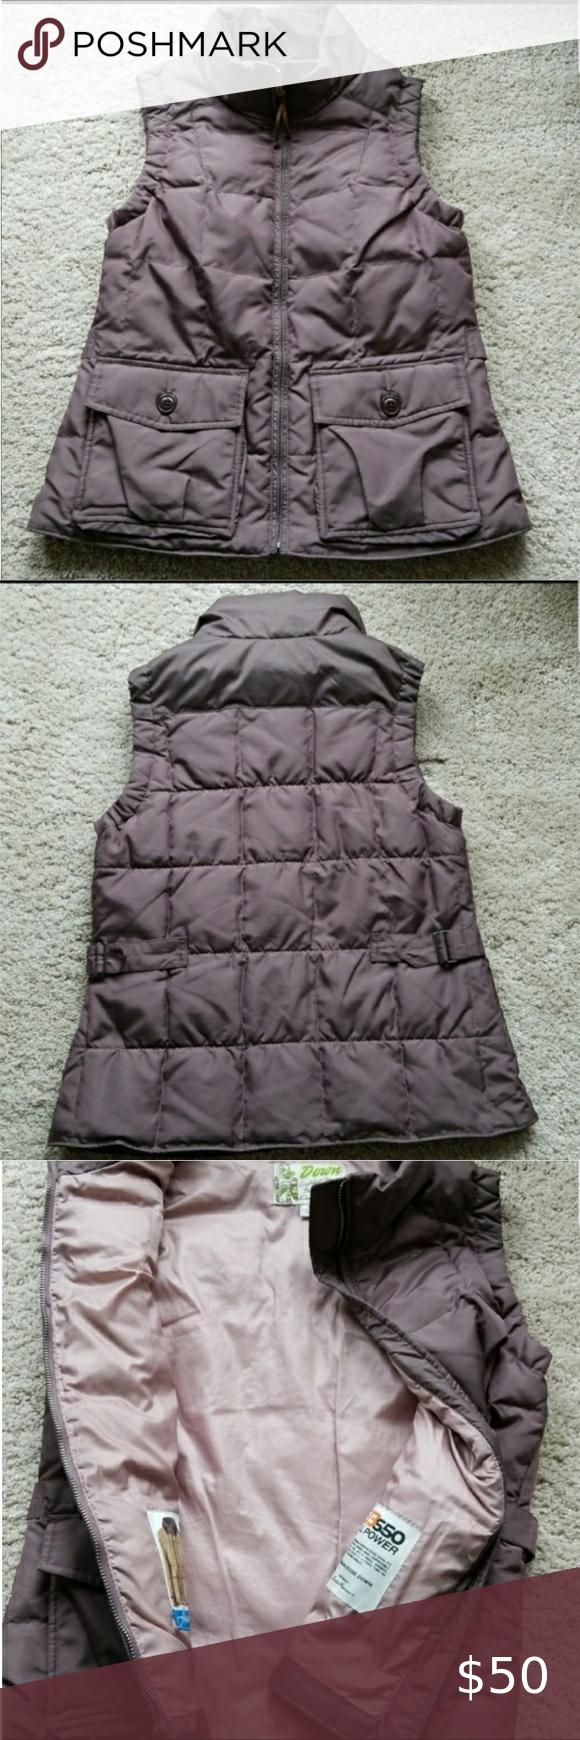 Eddie Bauer vest size M Eddie Bauer vest size M Ex